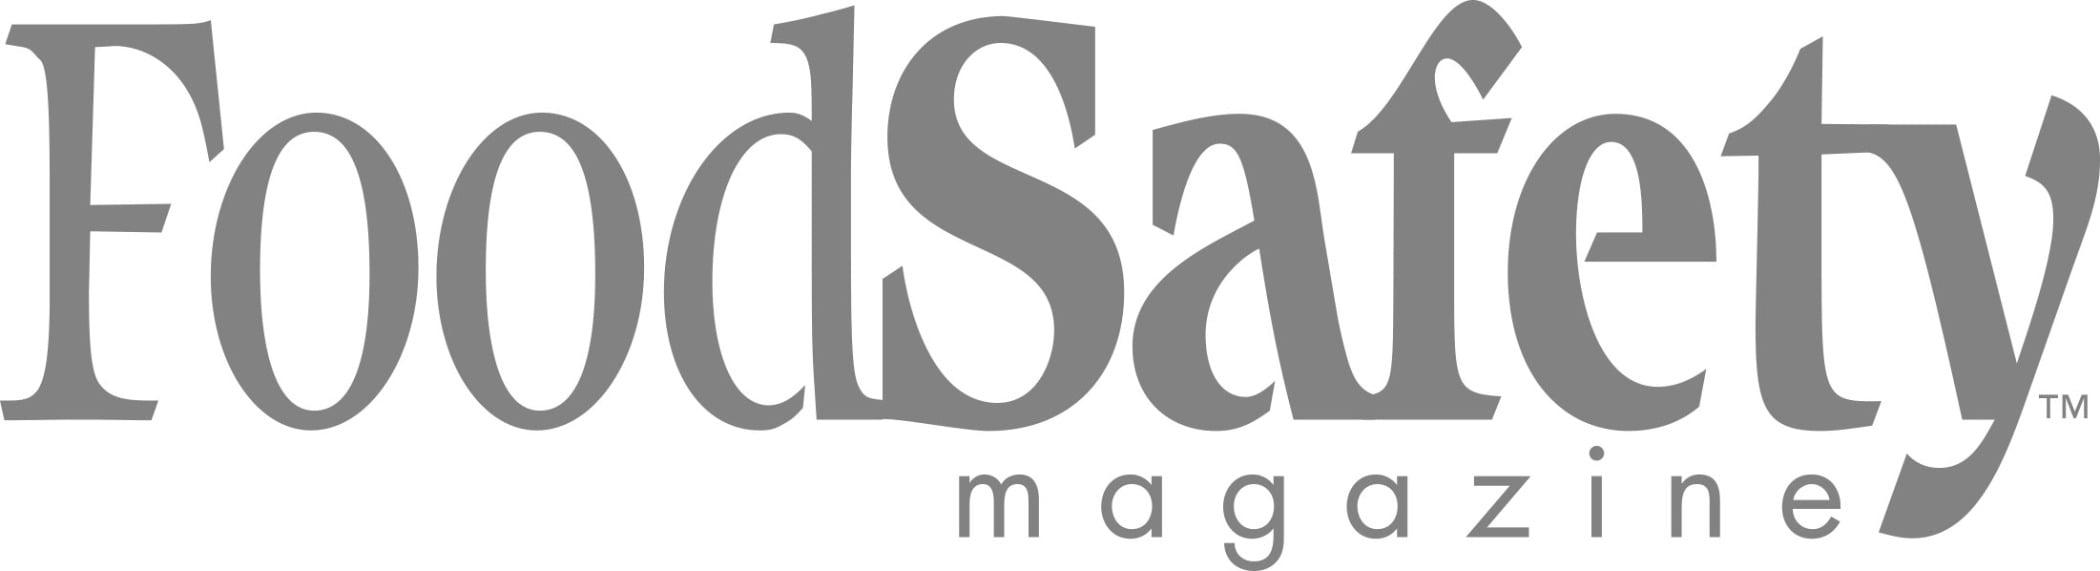 Logo, Text, Font